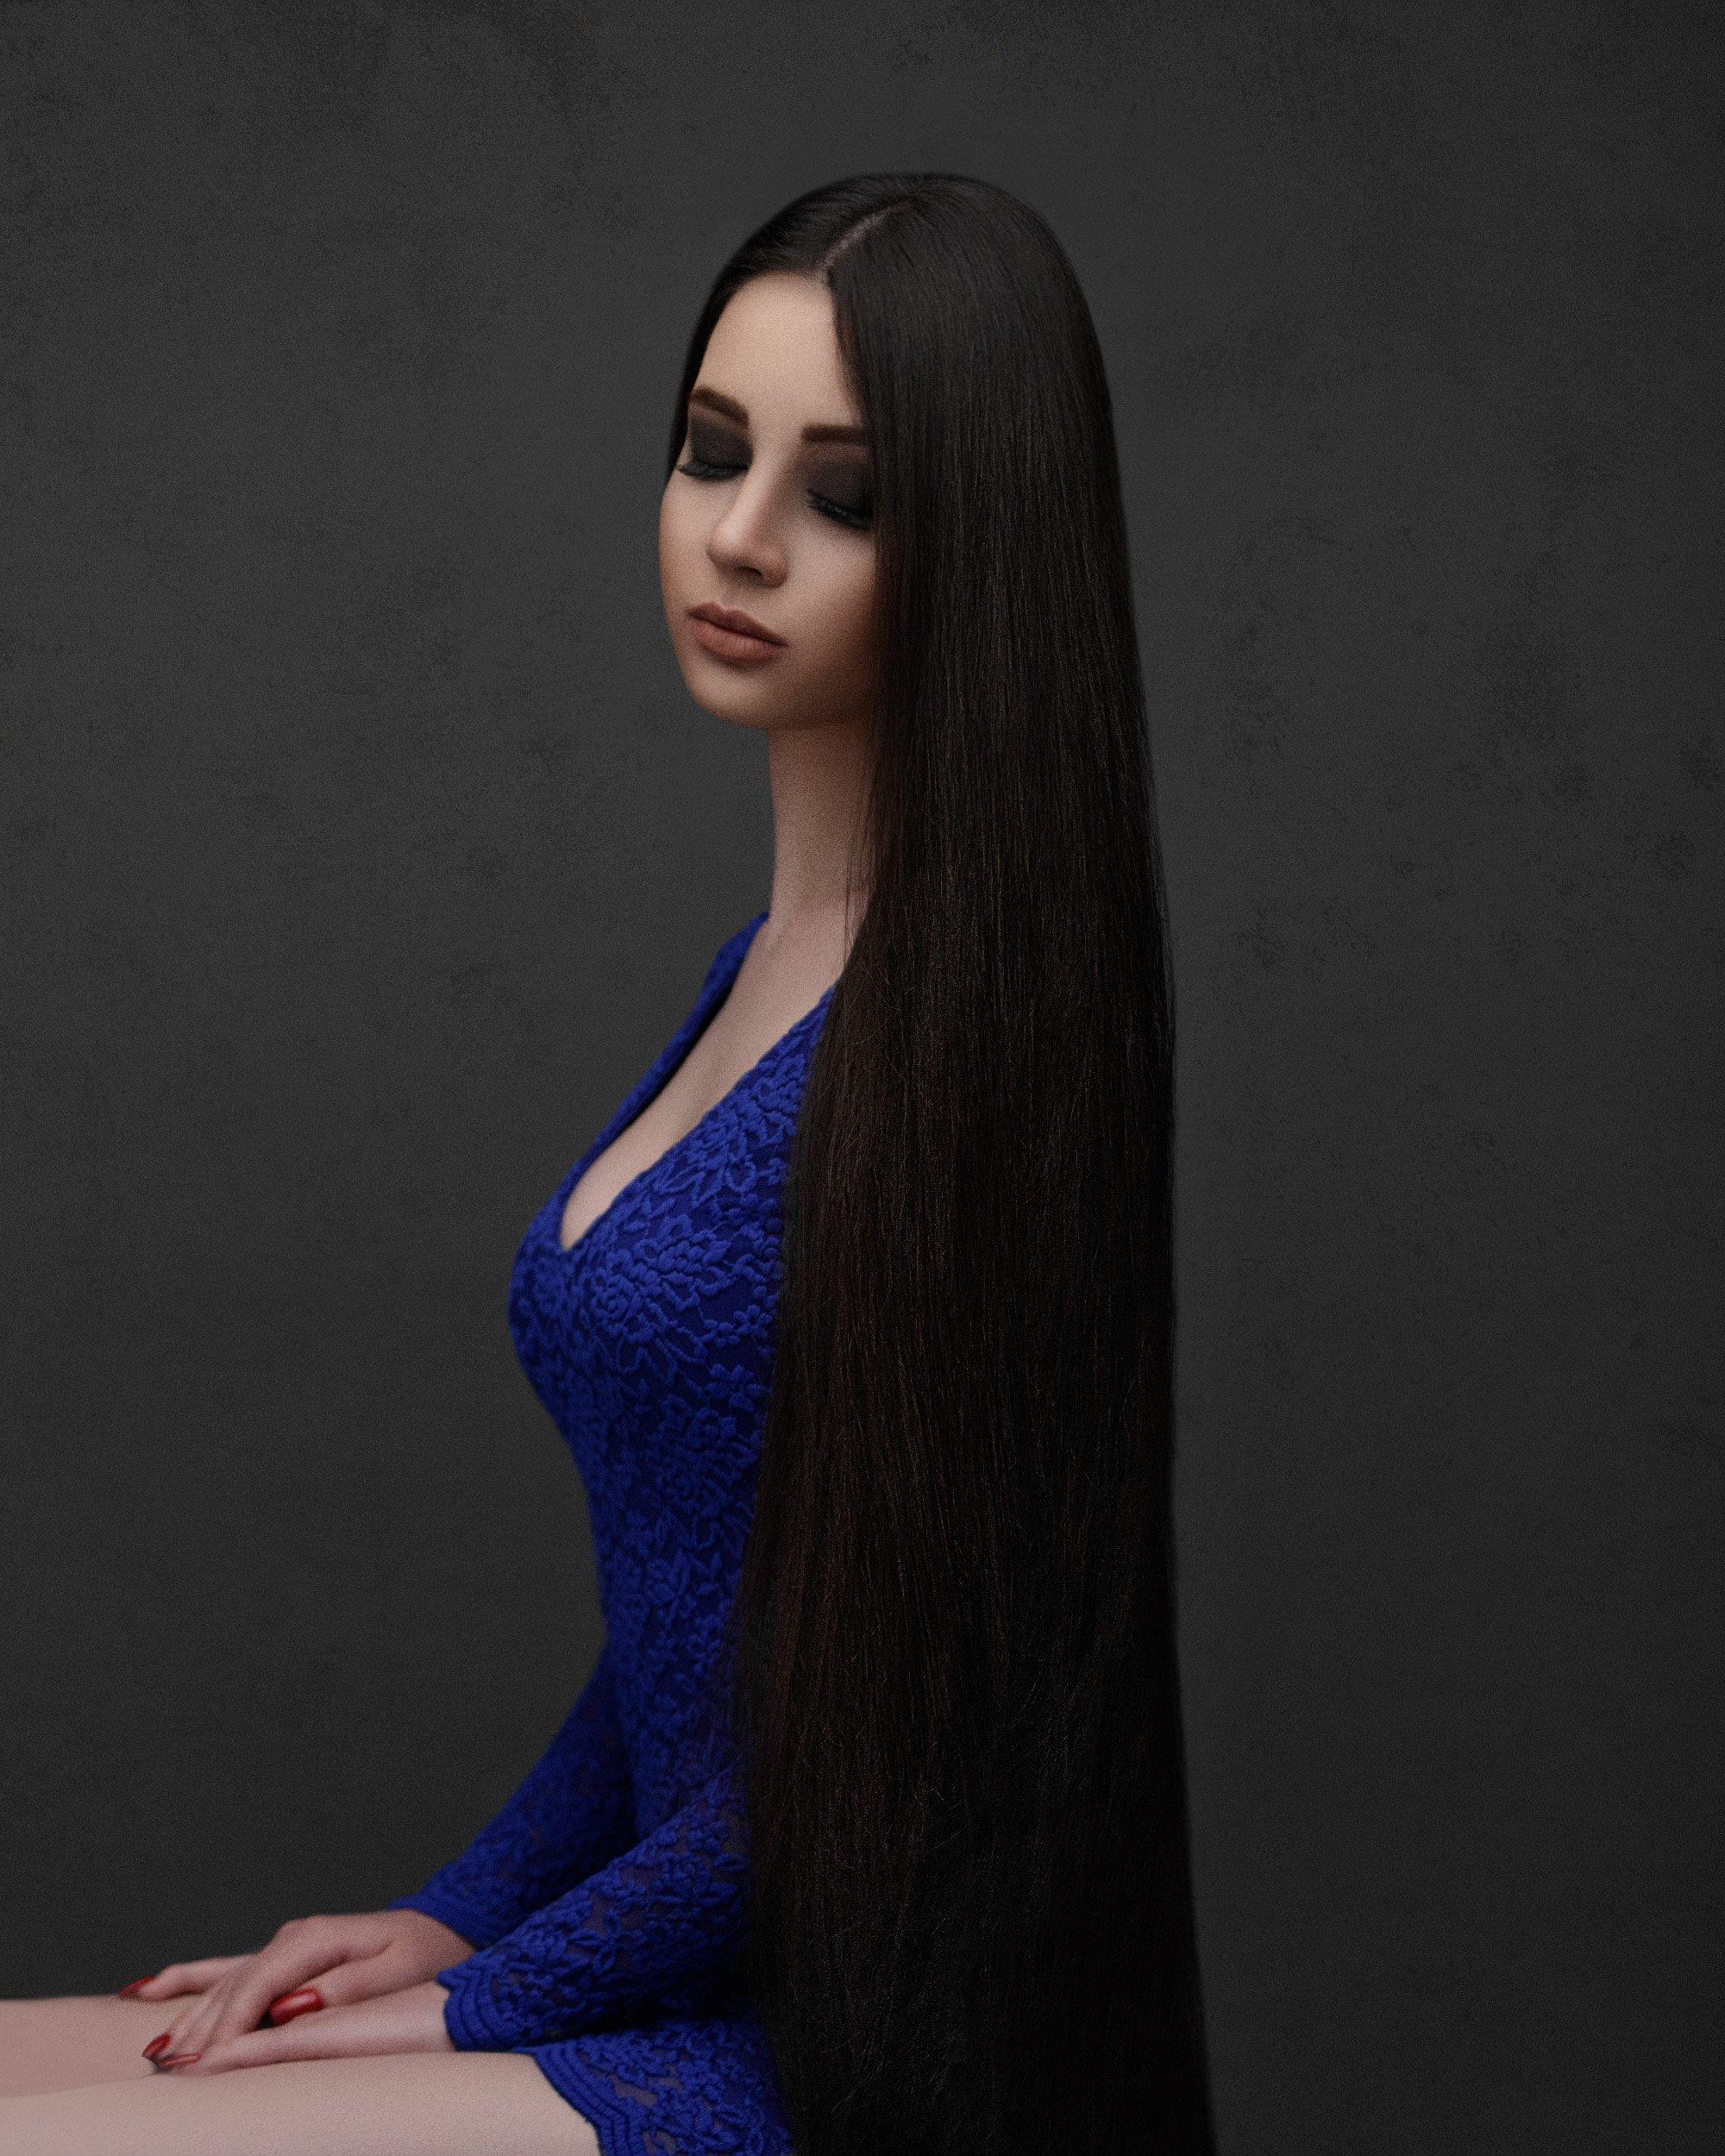 Portrait,Girl,Long,Hair,Mood,, Amirhossein kazemi